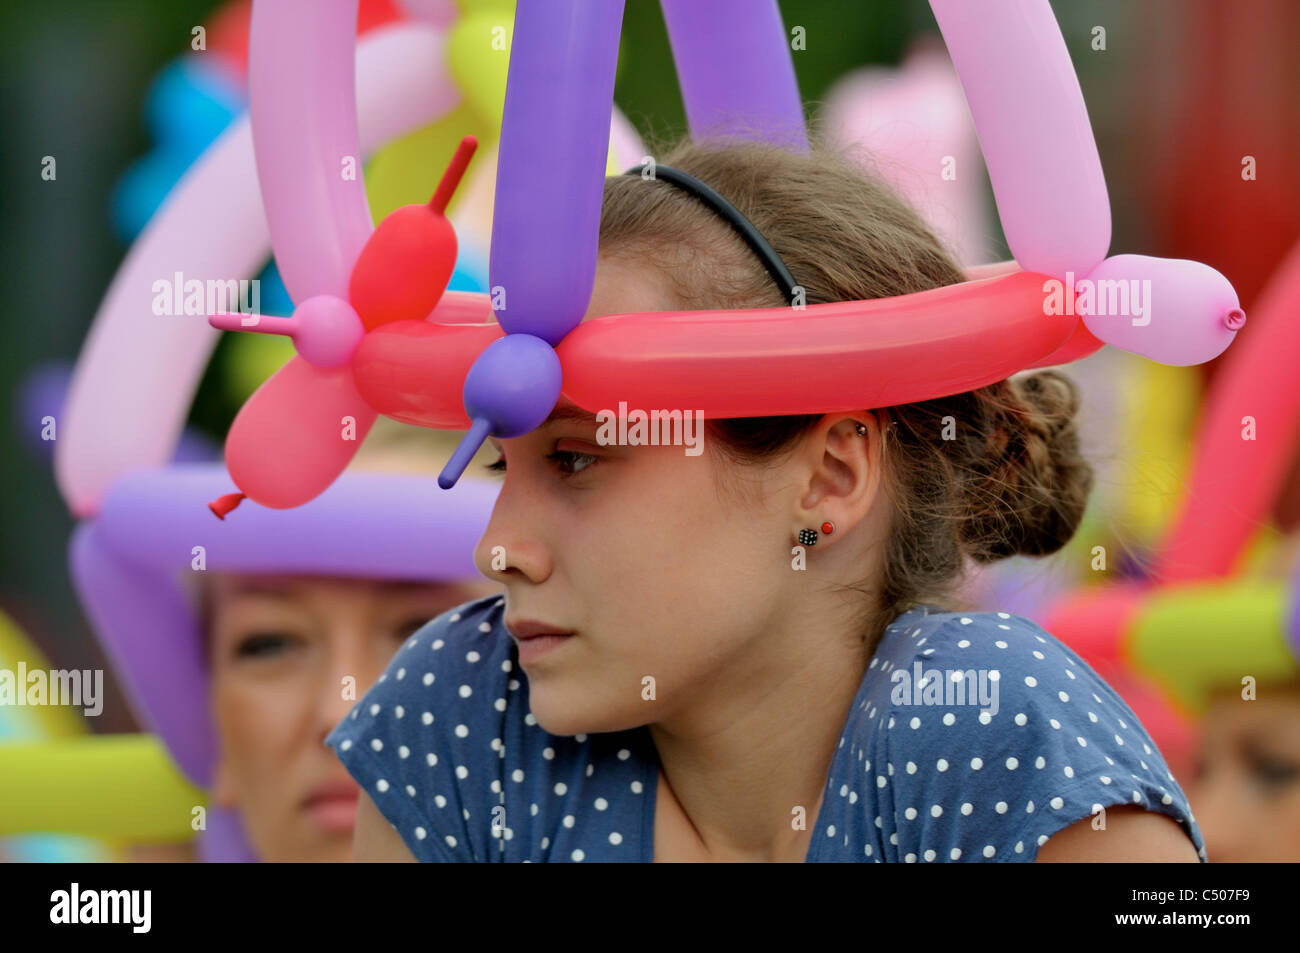 Young girl at the fun fair - Stock Image